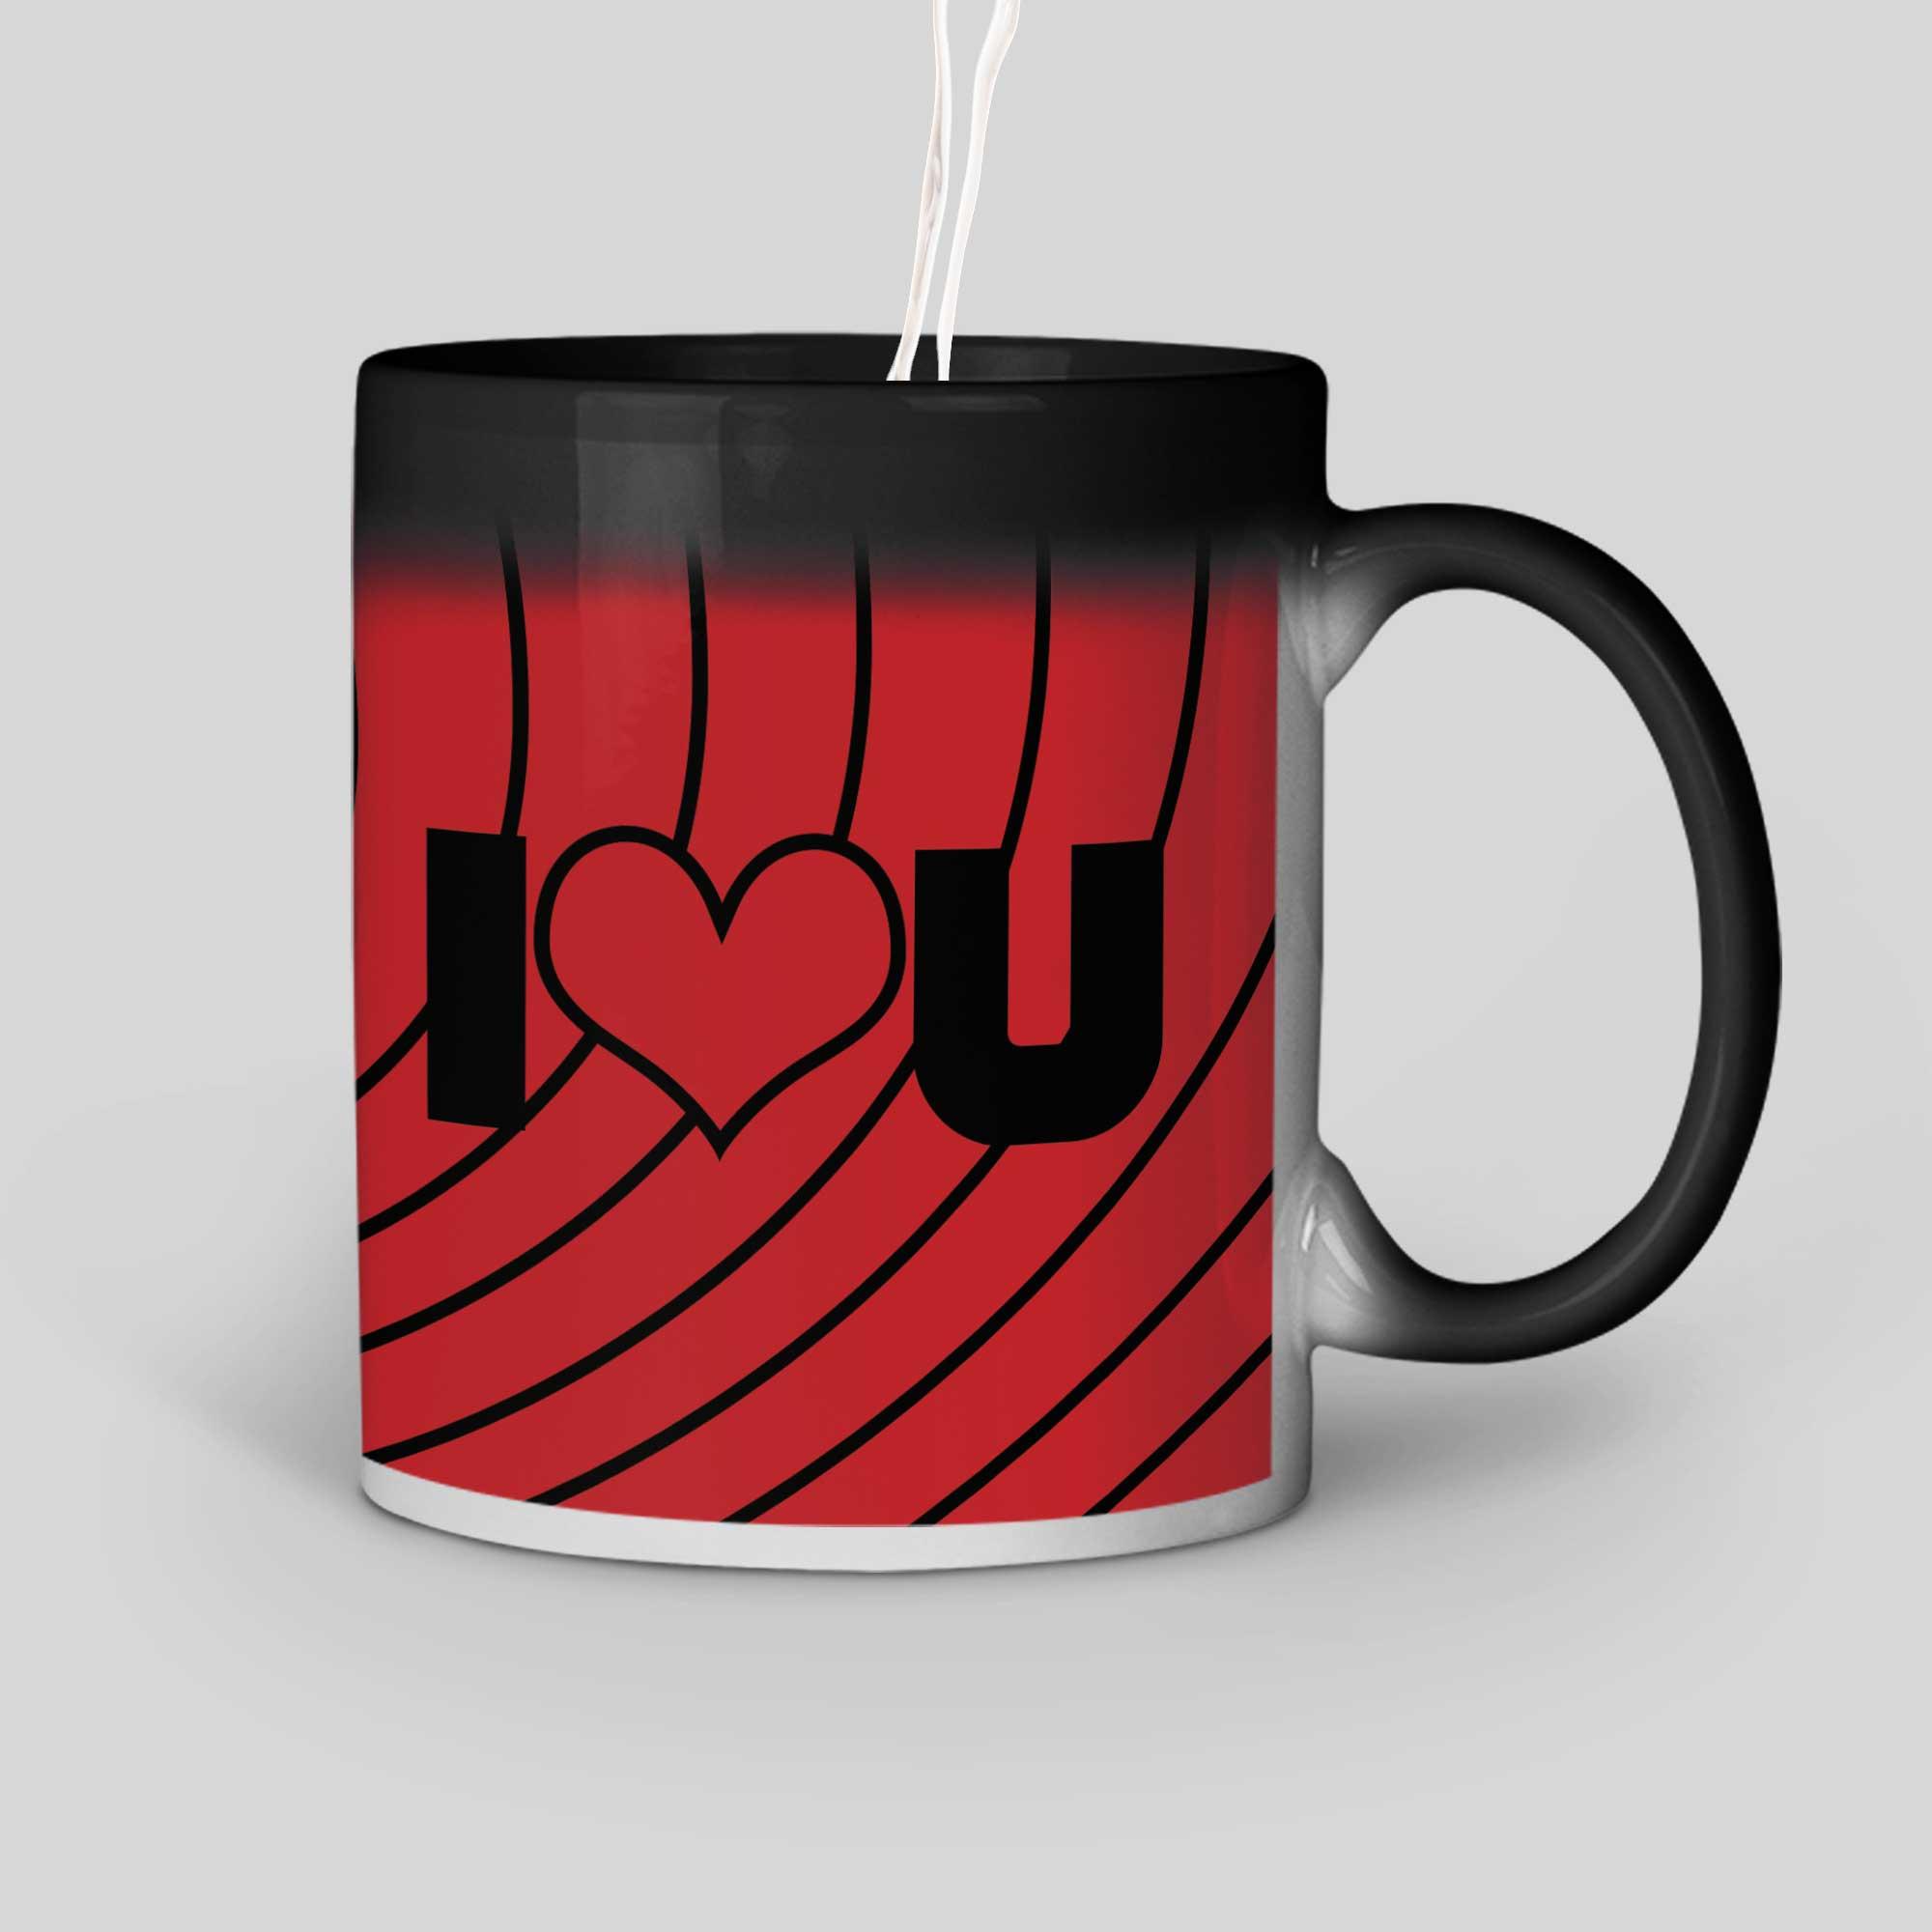 I Love You Personalized Magic Mug Right Side